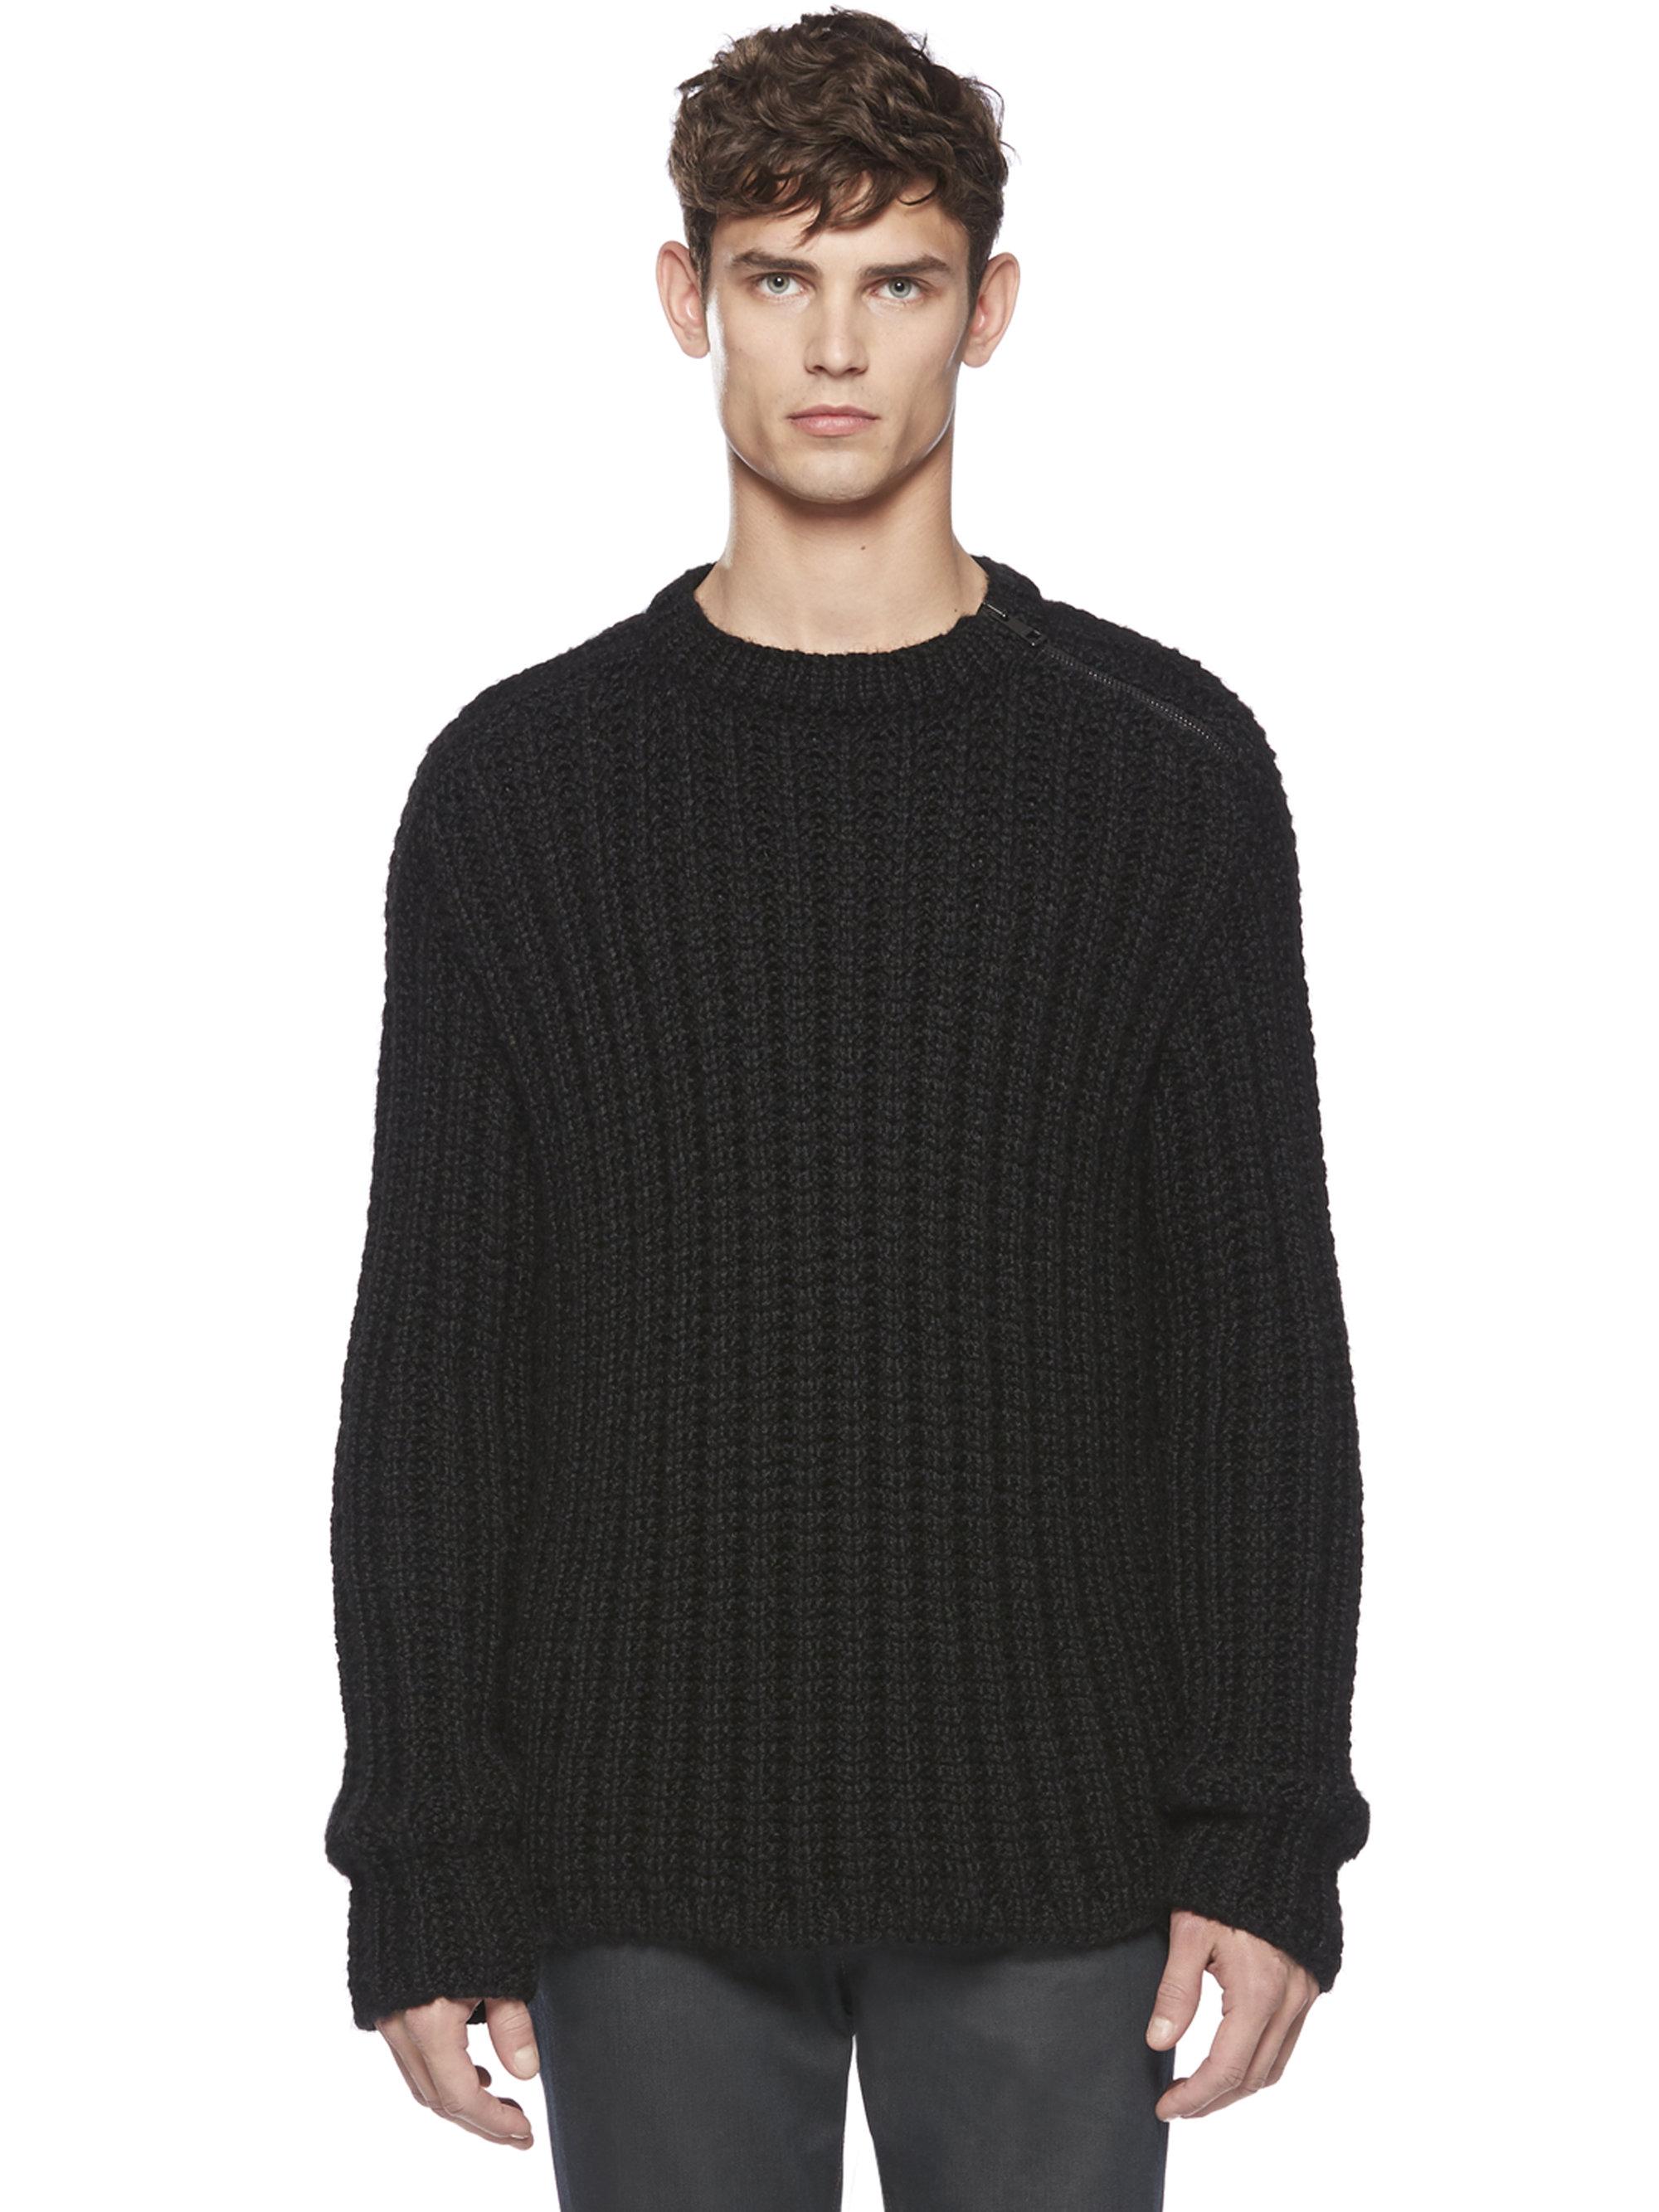 Isabel Marant Nordic Crewneck Star Intarsia Boxy Wool-Mohair Sweater Details Isabel Marant